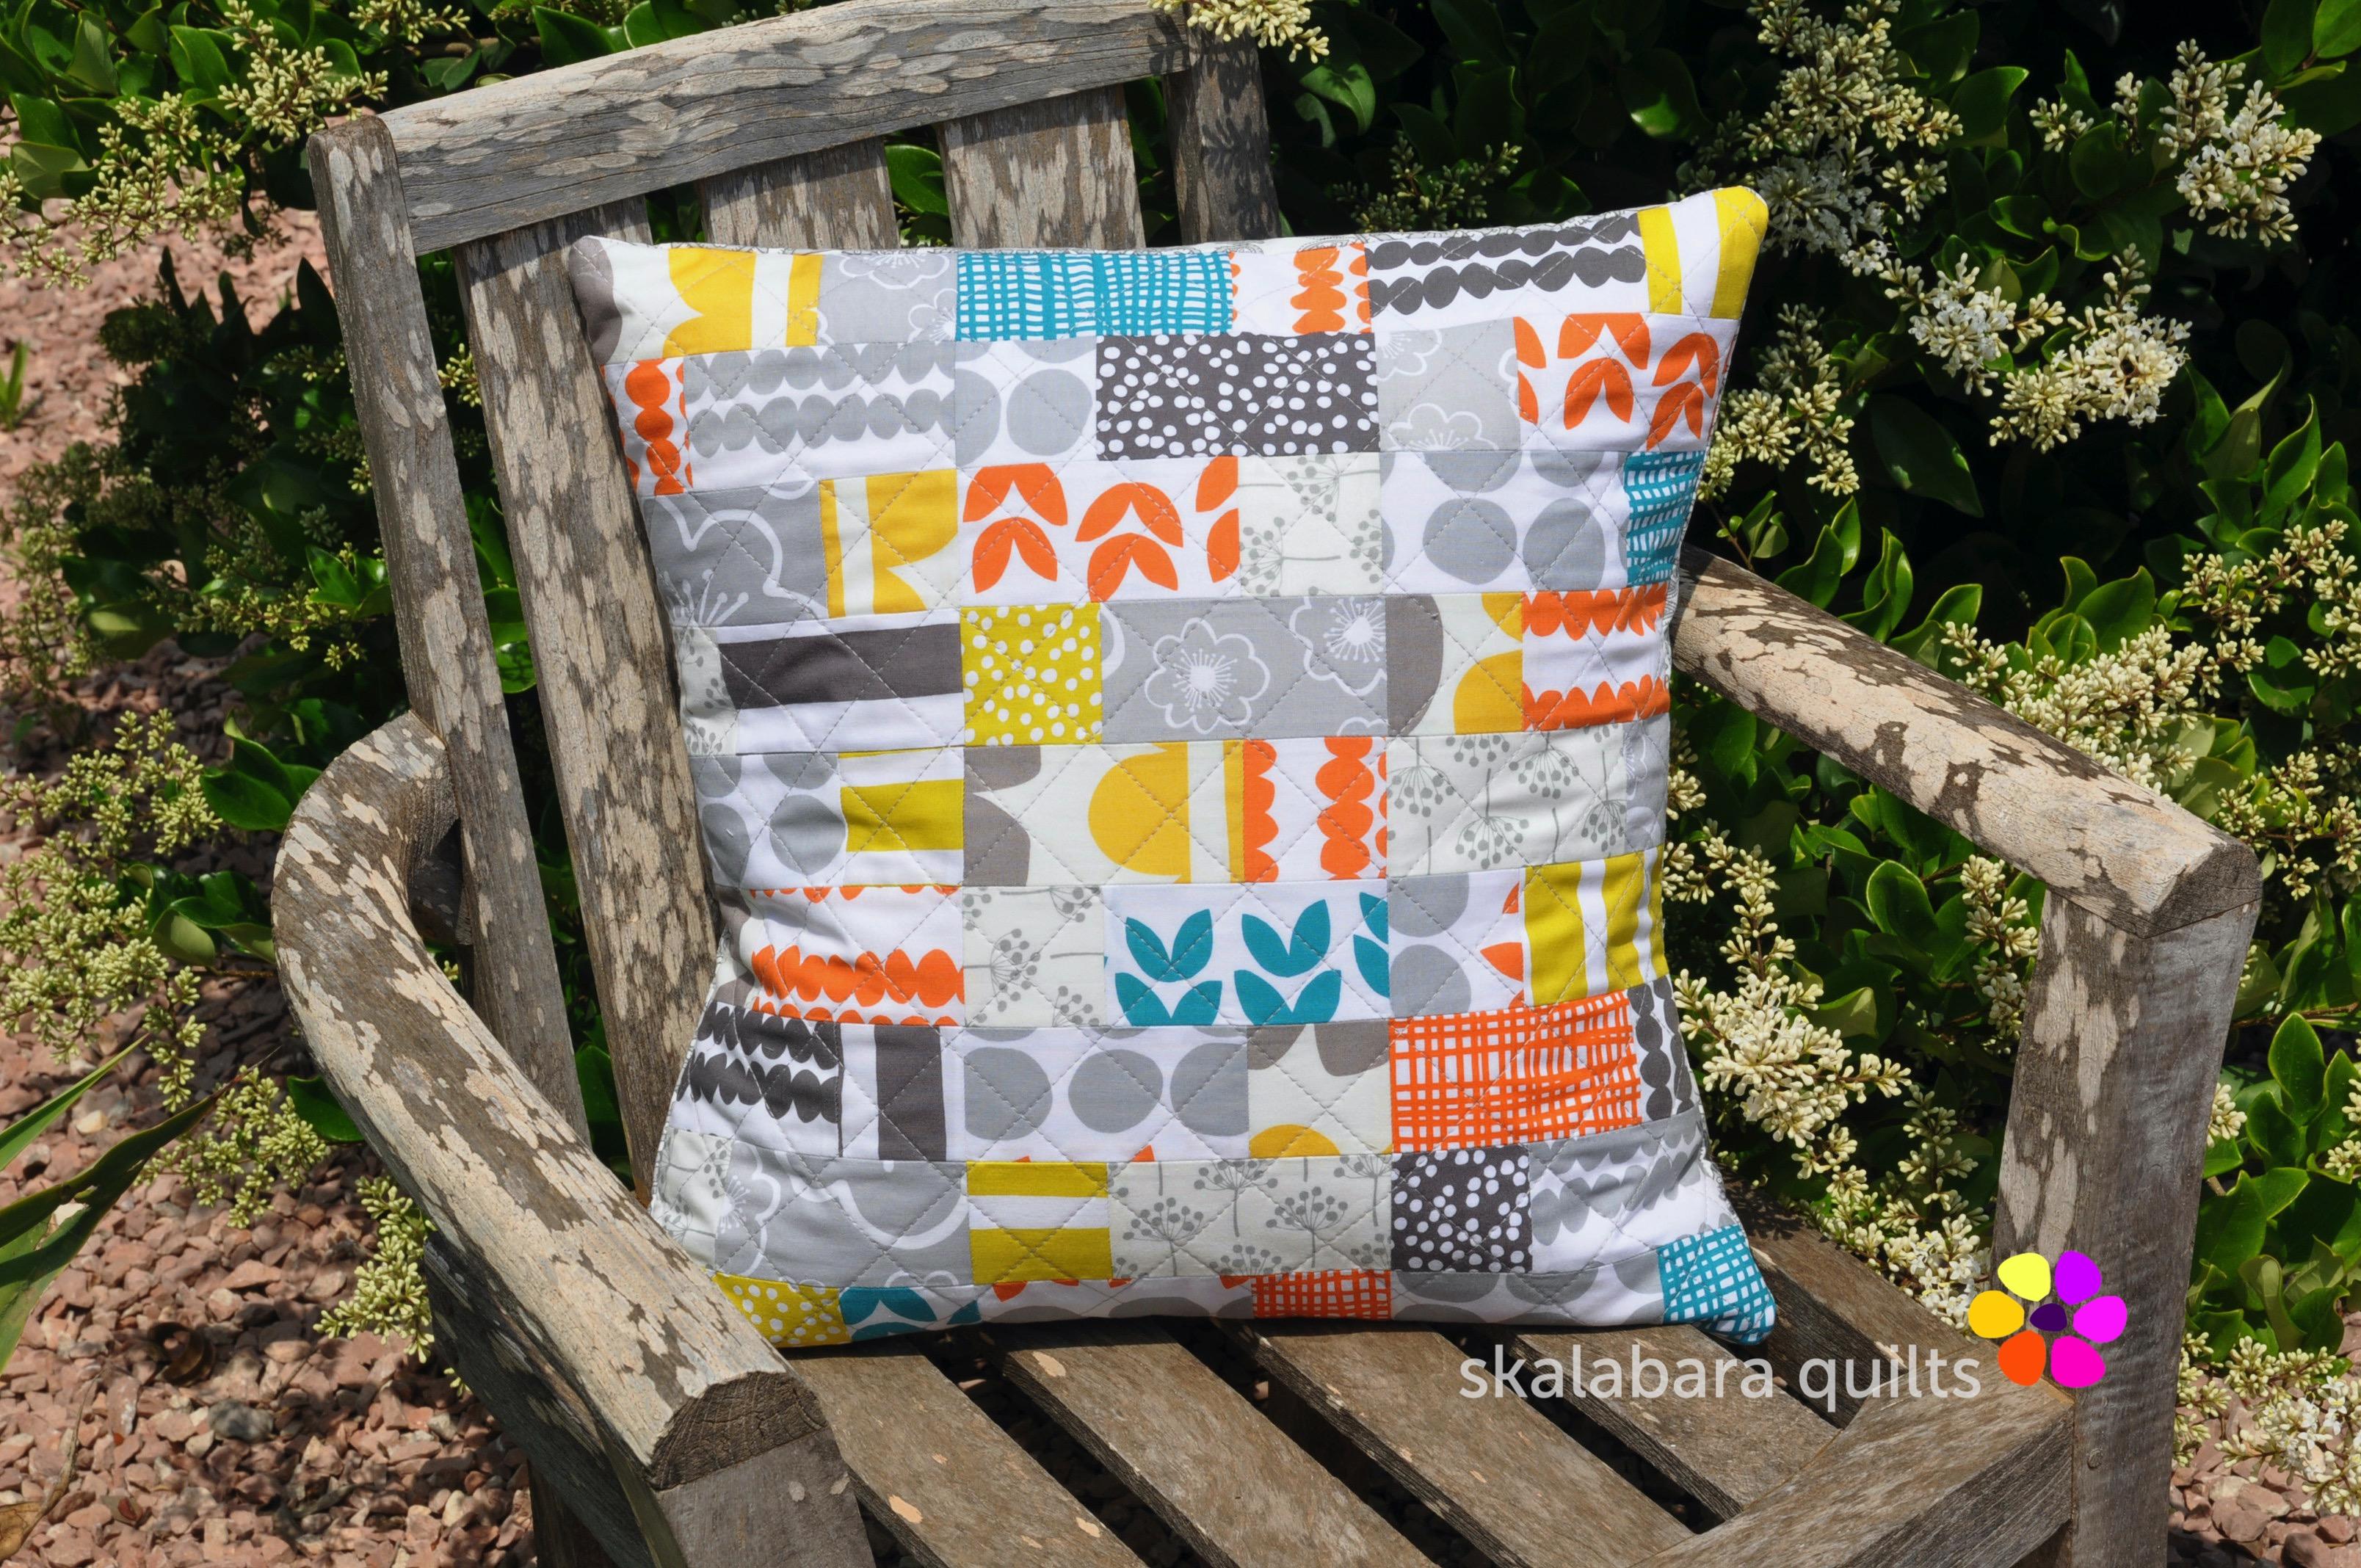 bella cushion cover squares and rectangles 2 - skalabara quilts